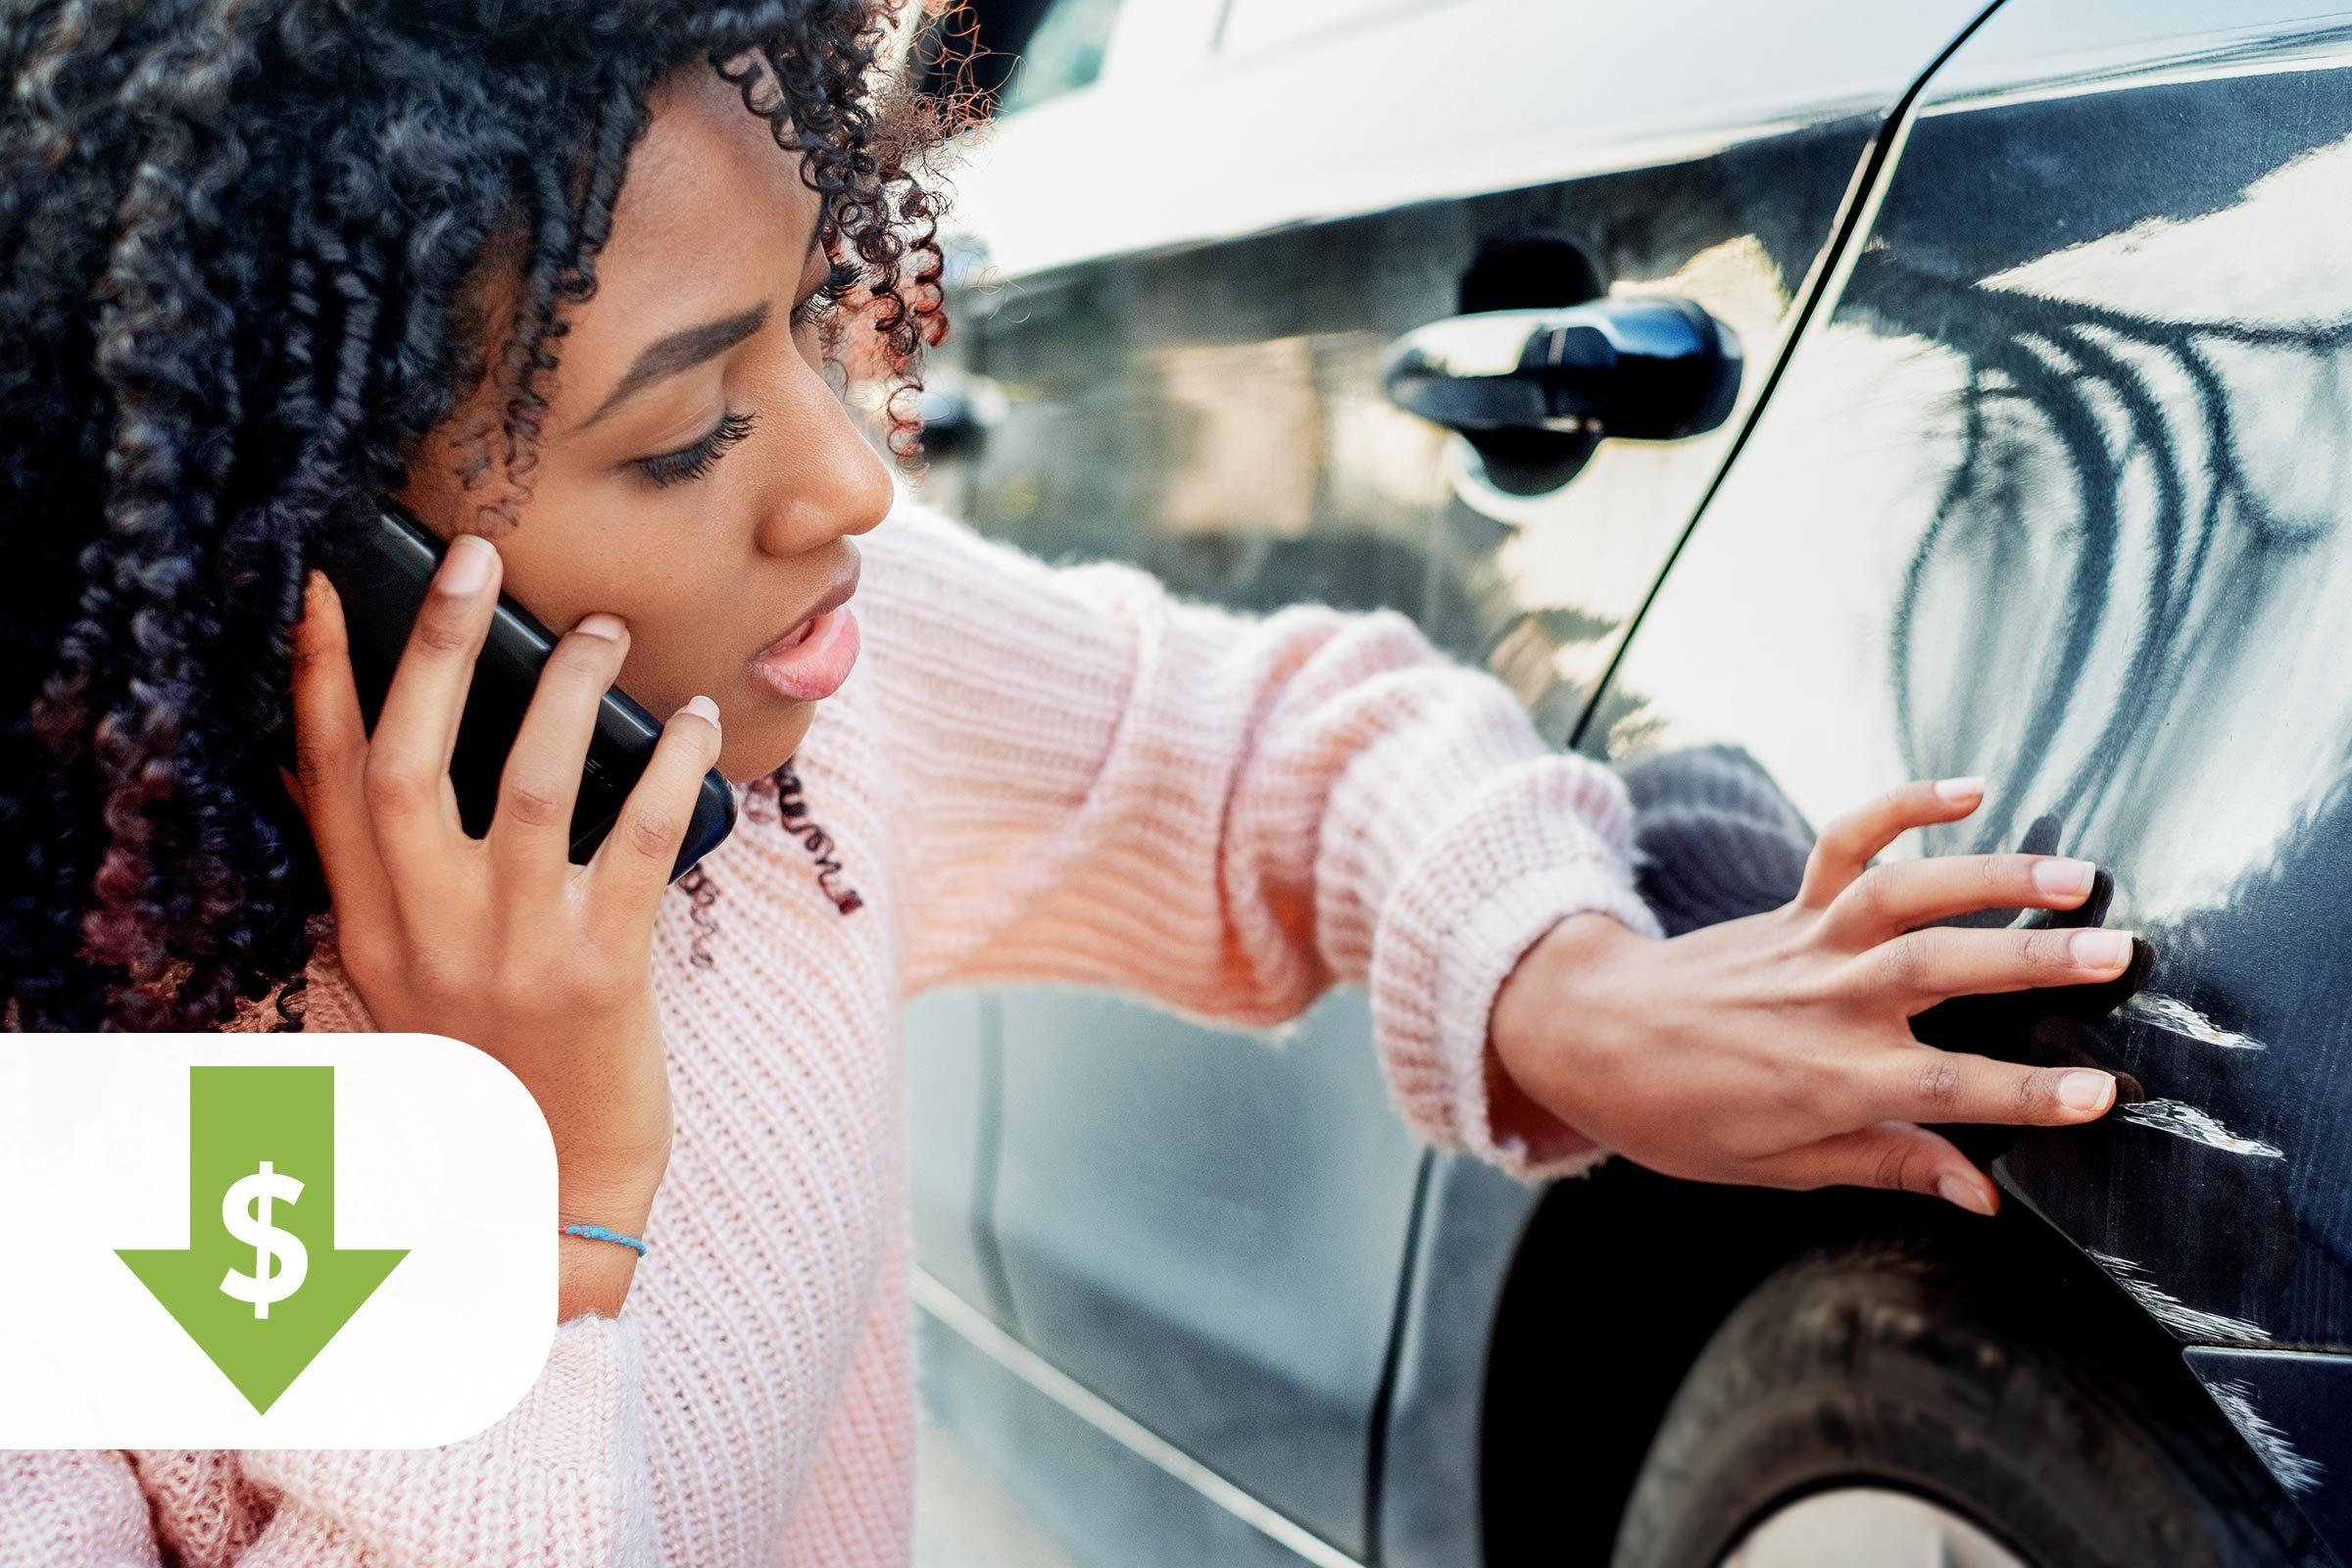 Cheaper: car insurance